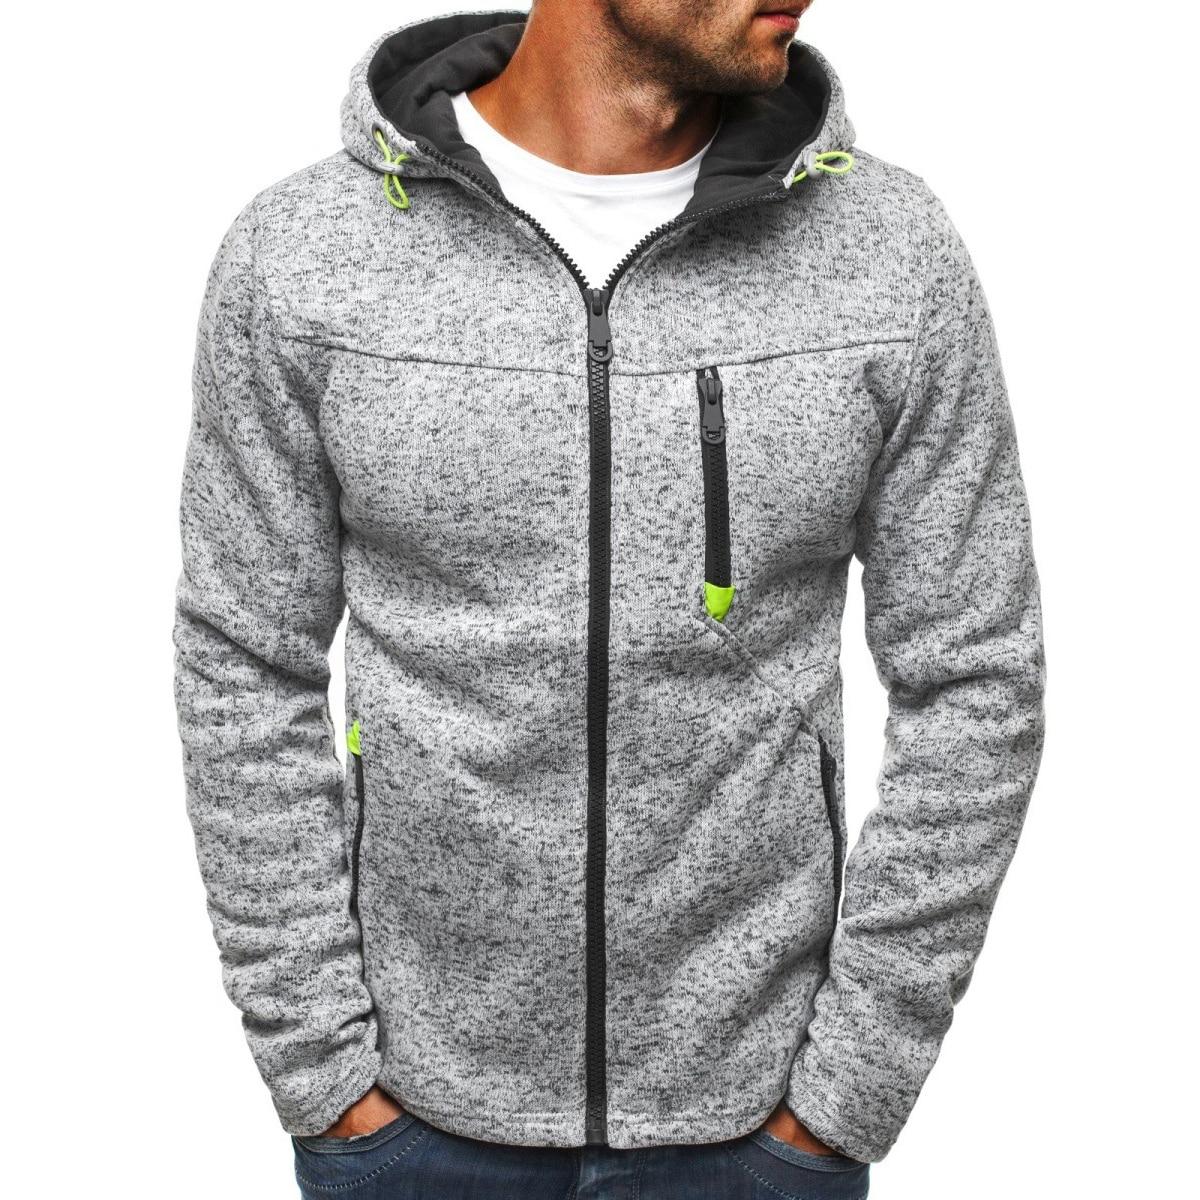 MRMT 2020 Brand Jacquard Hoodie Fleece Cardigan Hooded Coat Men's Hoodies Sweatshirts Pullover For Male Hoody Sweatshirt(China)